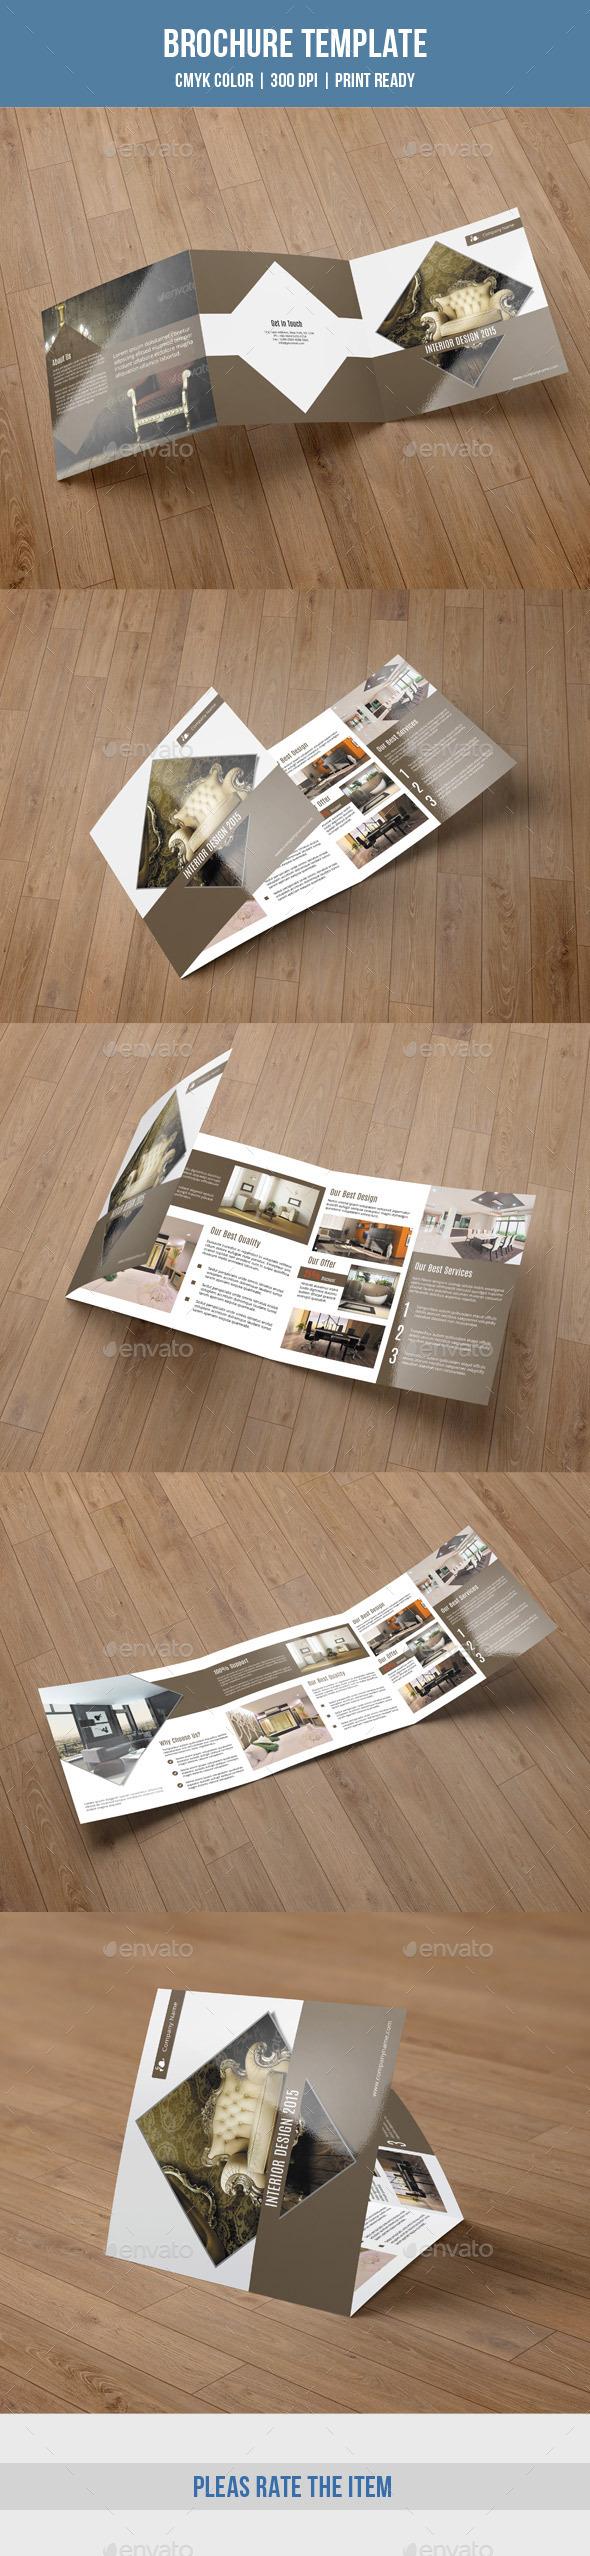 GraphicRiver Square Trifold For Interior Design-V49 9564559